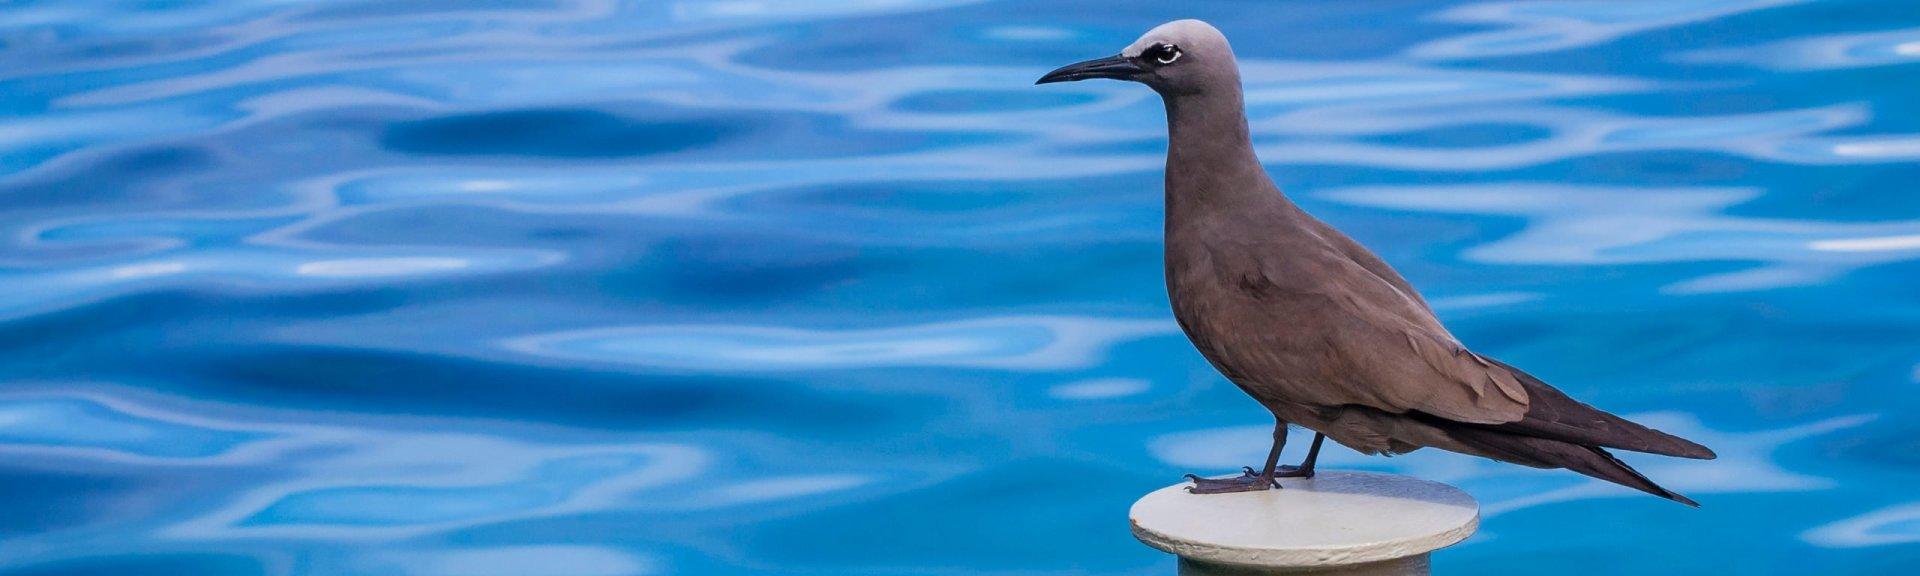 Where Is Christmas Island.Common Noddy Christmas Island National Park